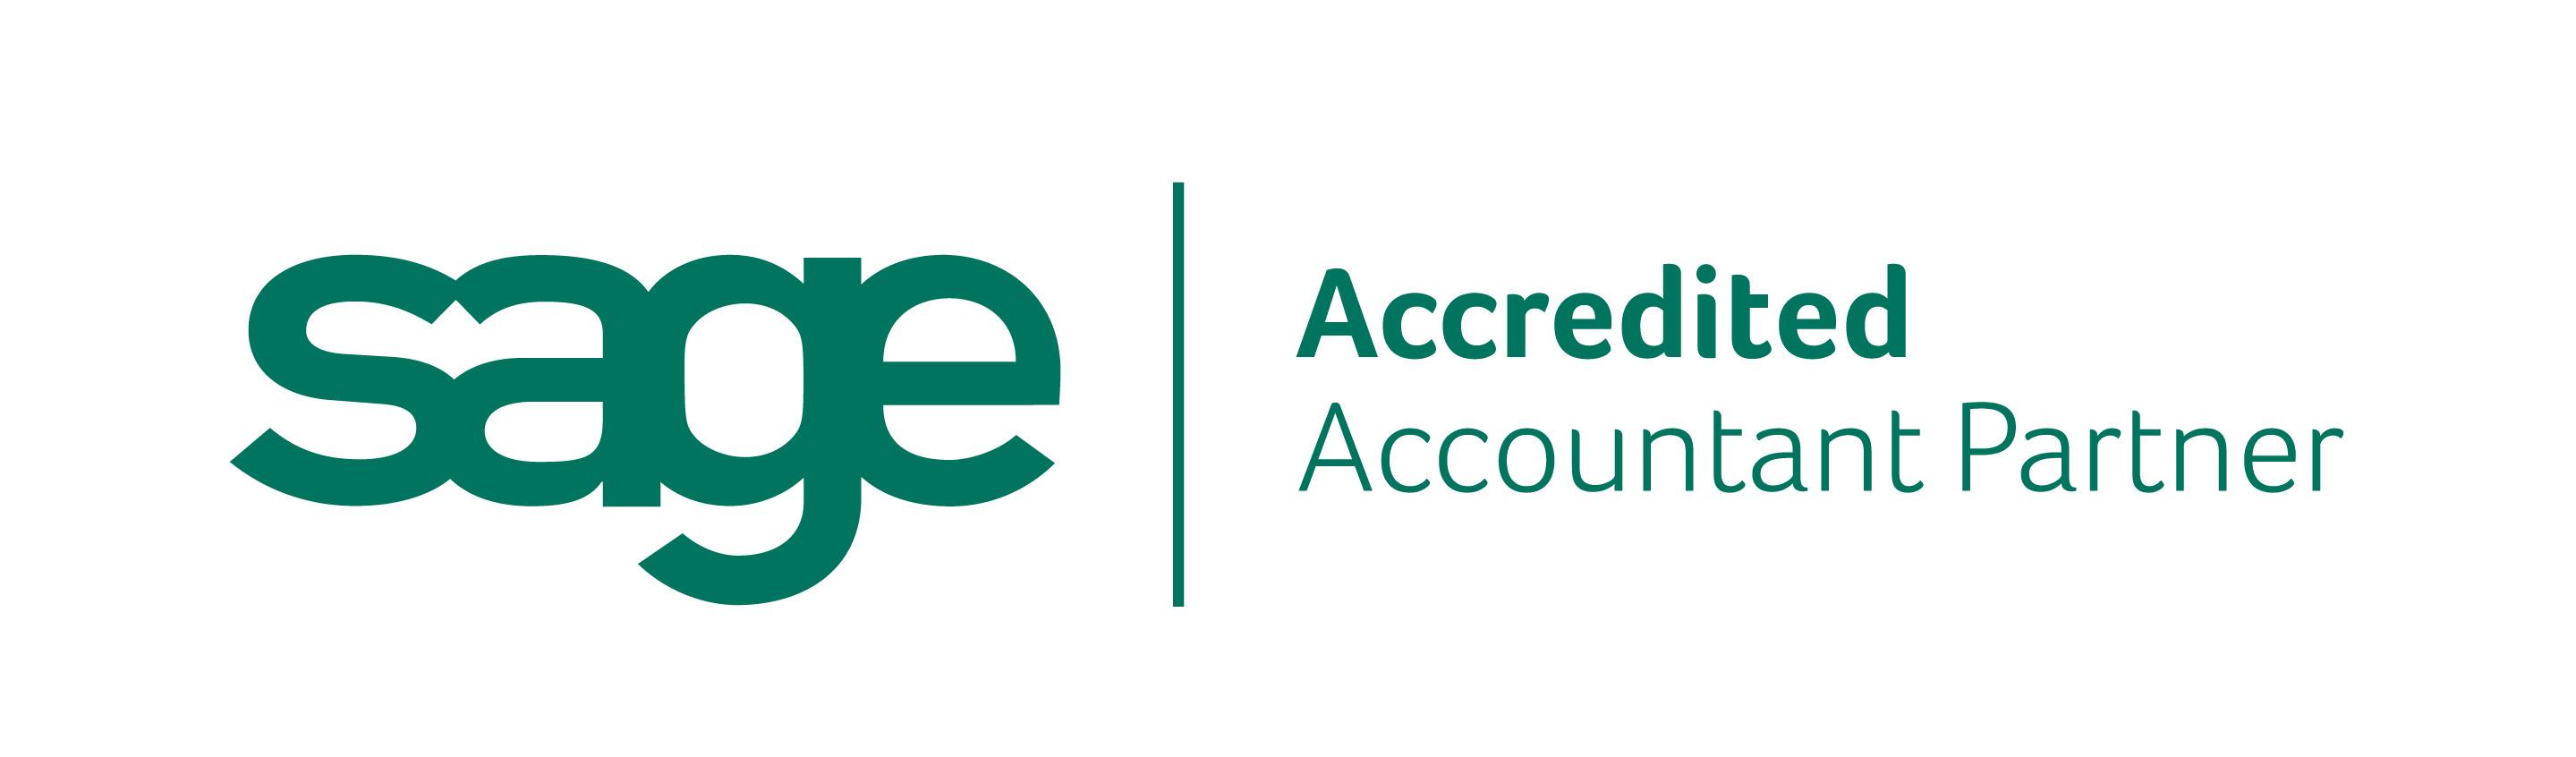 sage-accredited-accountant-partner-logo